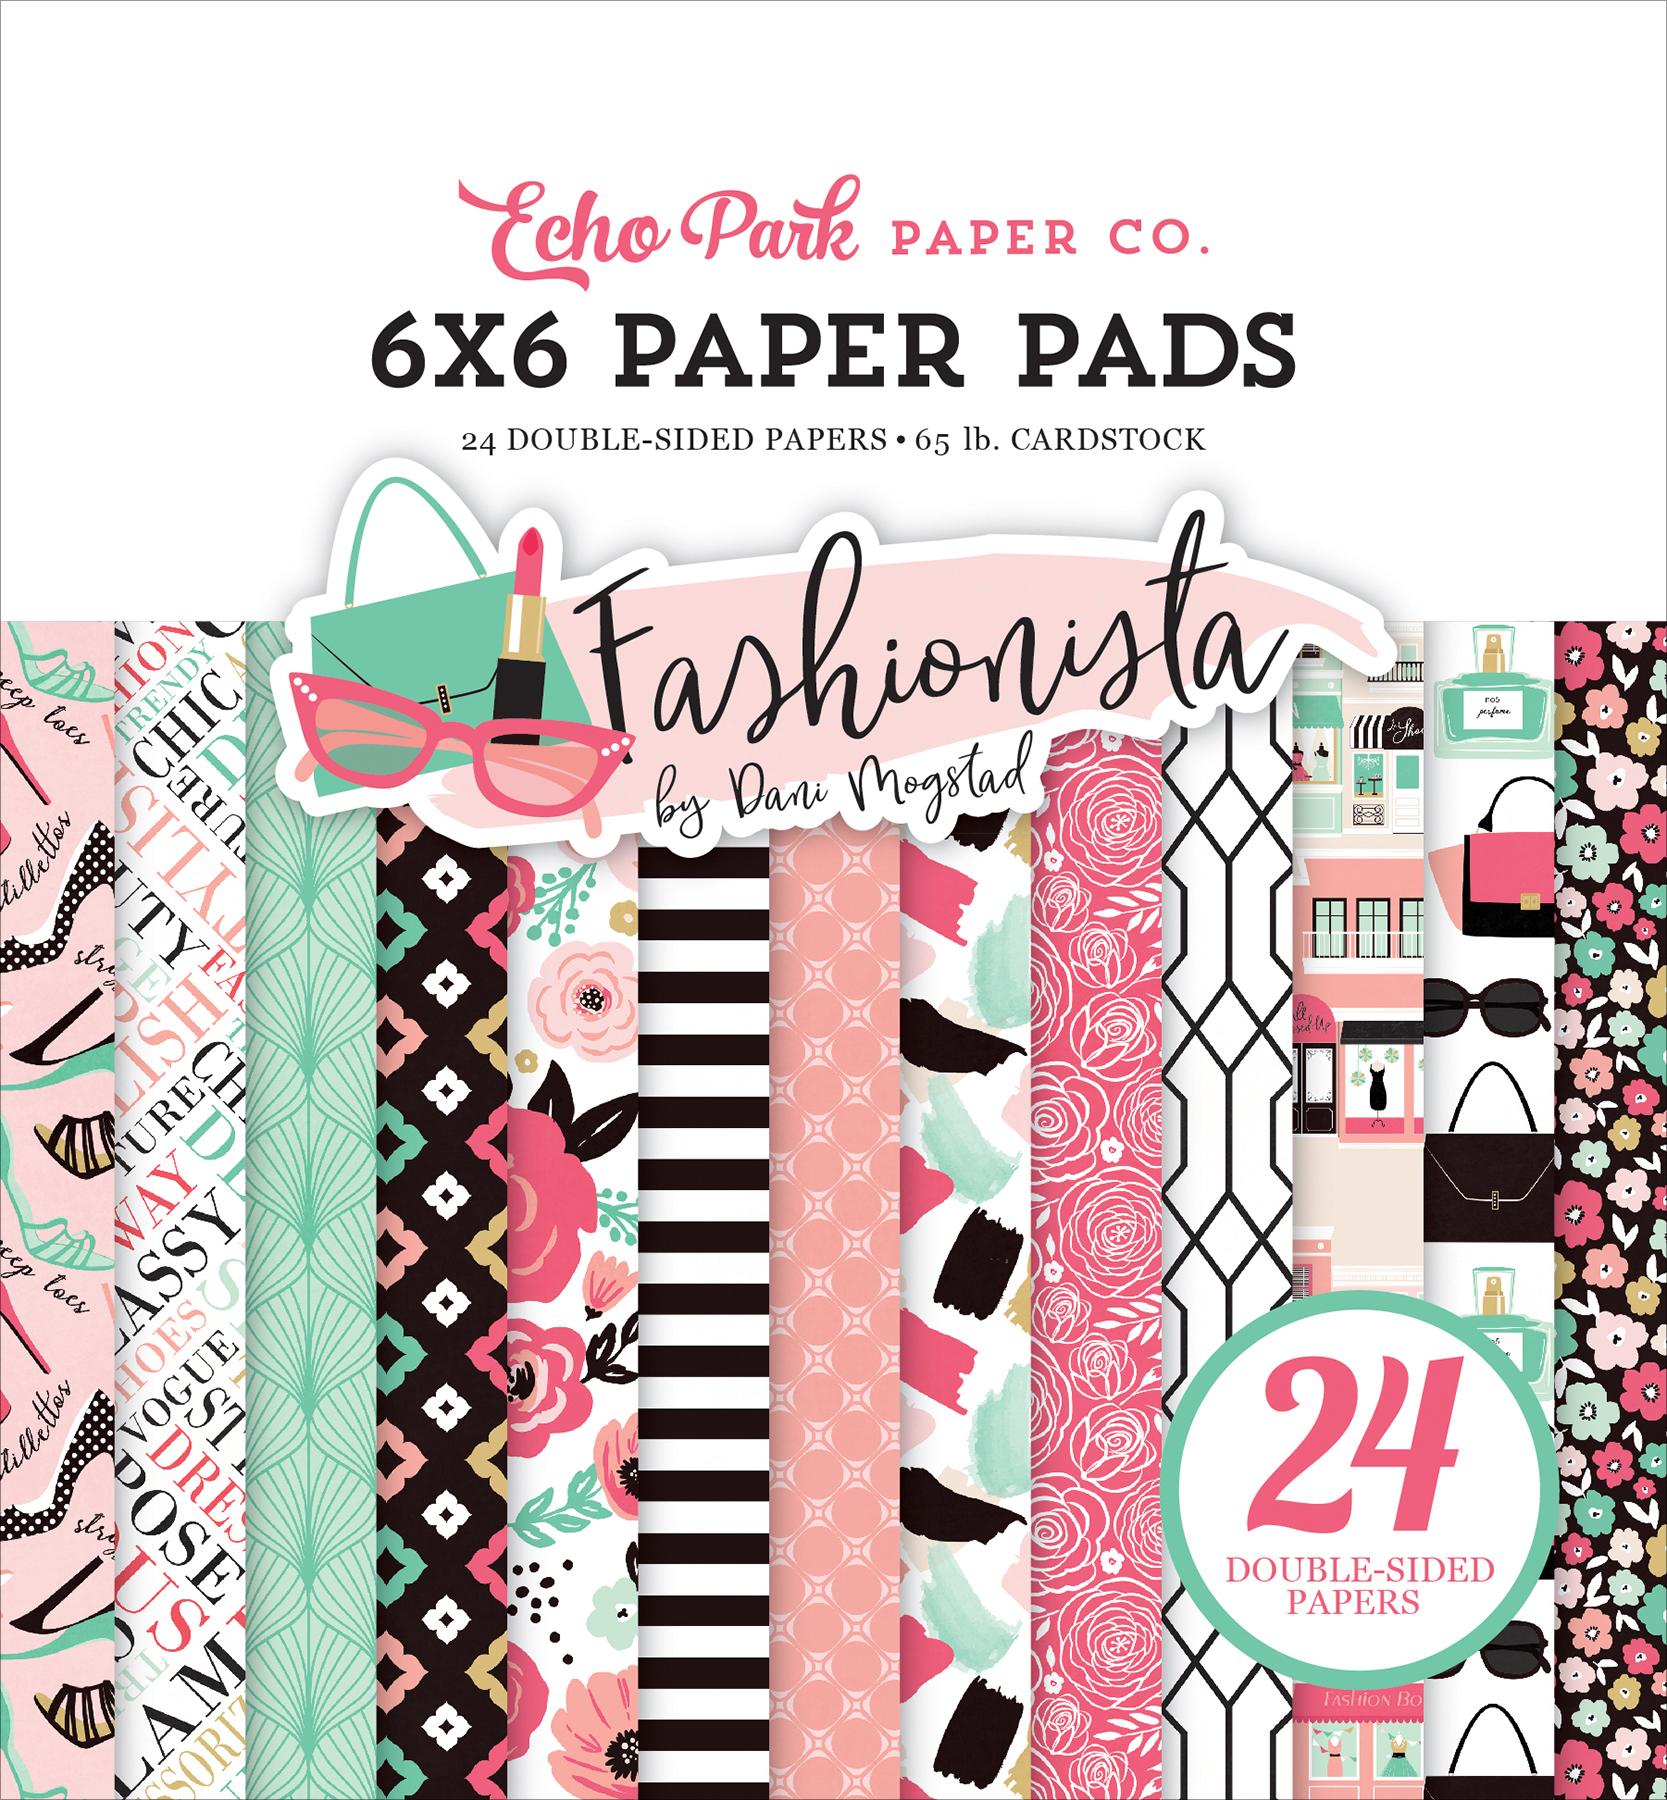 Echo Park Double-Sided Paper Pad 6X6 24/Pkg-Fashionista, 12 Designs/2 Each